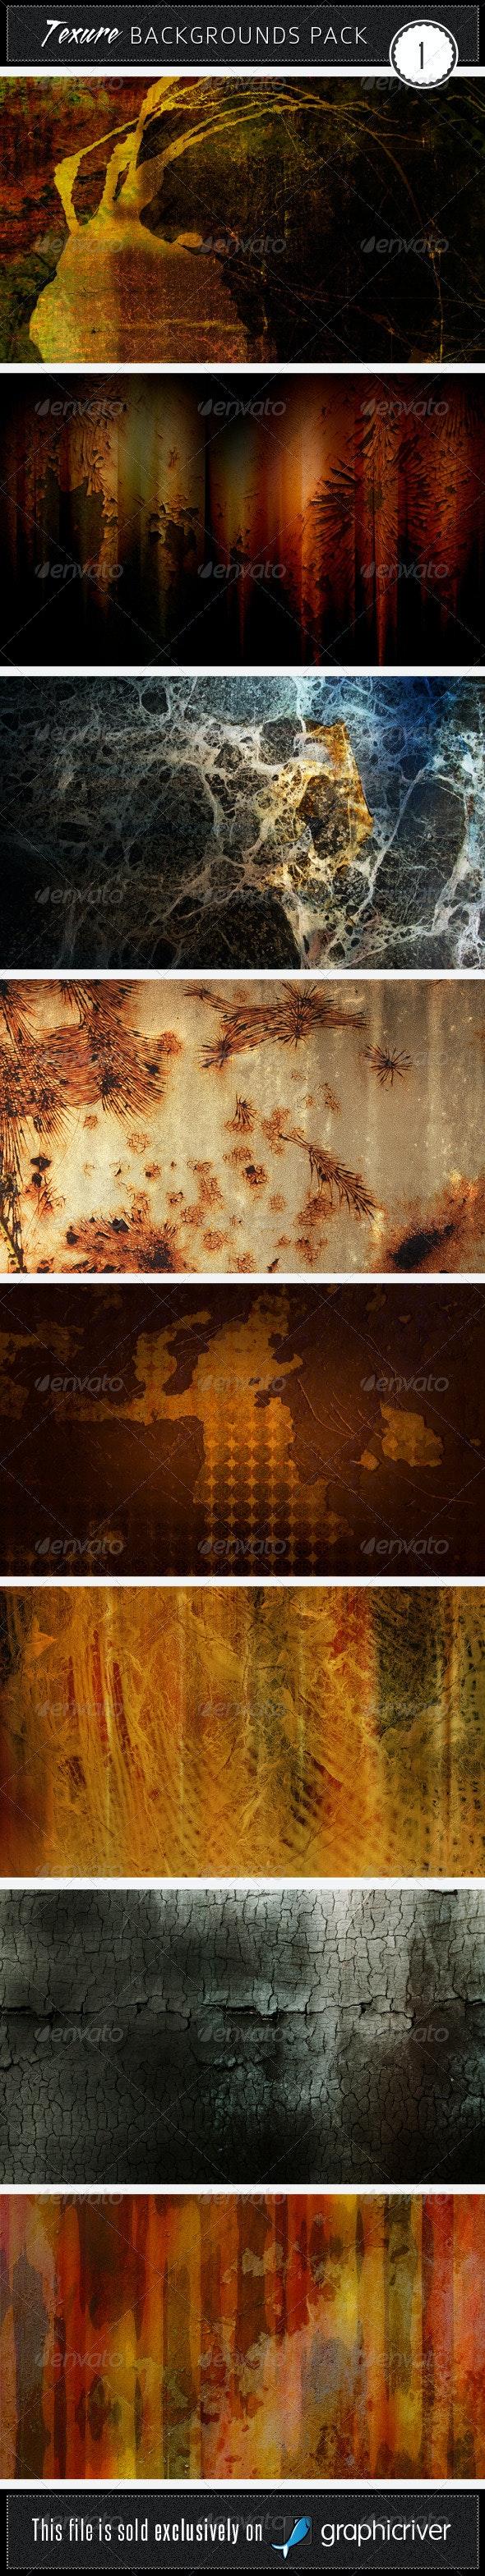 Texture Backgrounds Pack 1 - Miscellaneous Textures